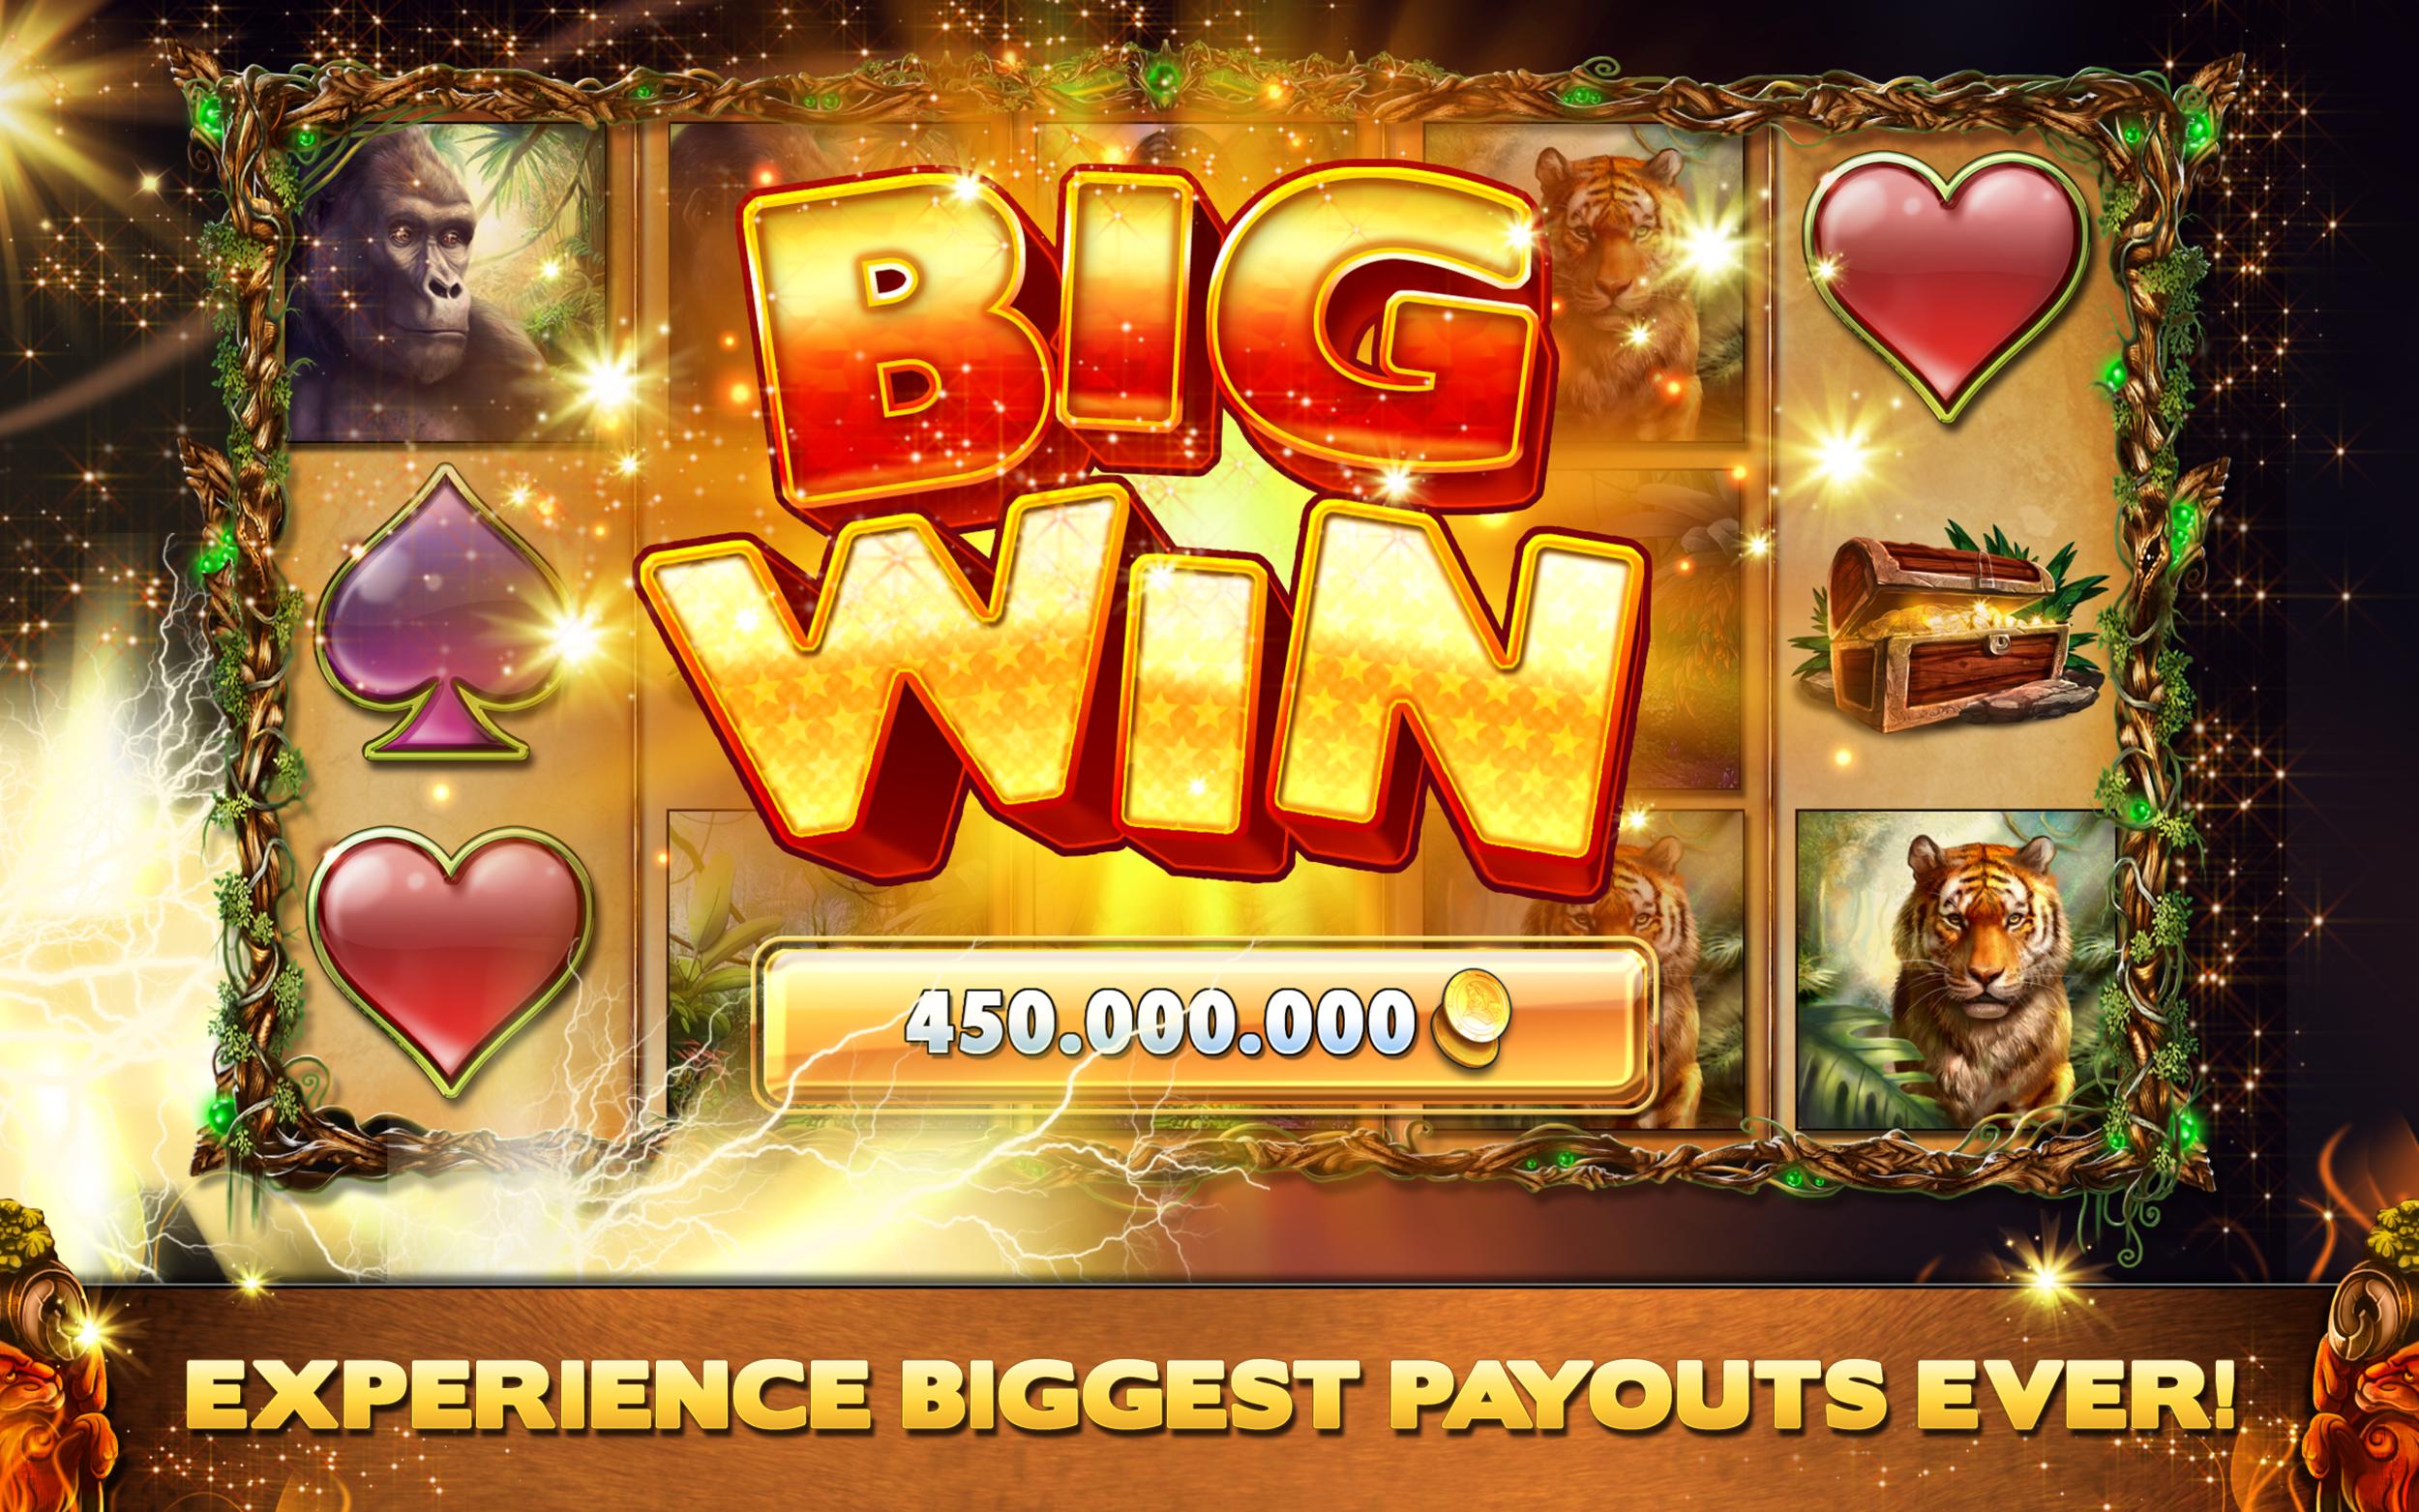 2560_1600_screen_03_big_payout.png